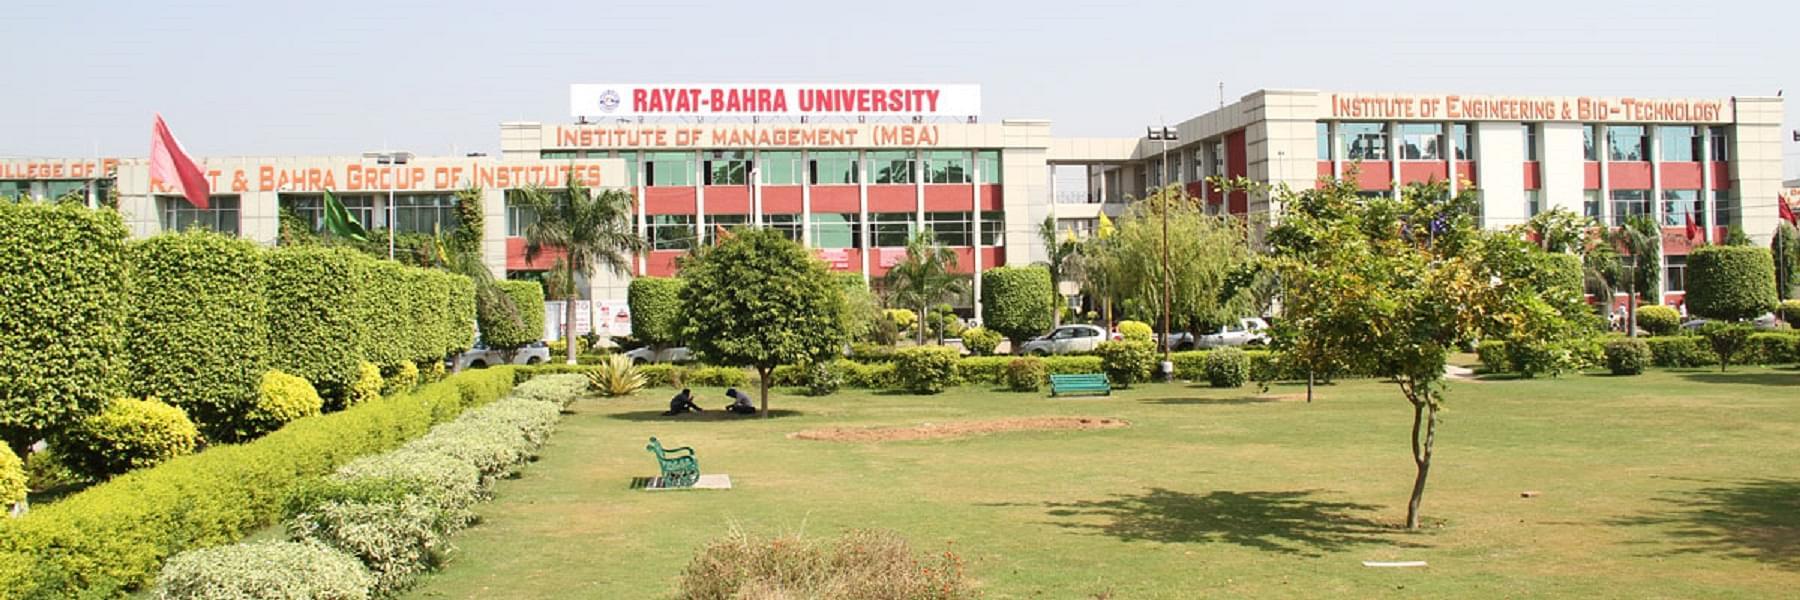 University School of Law, Rayat Bahra University - [USL]